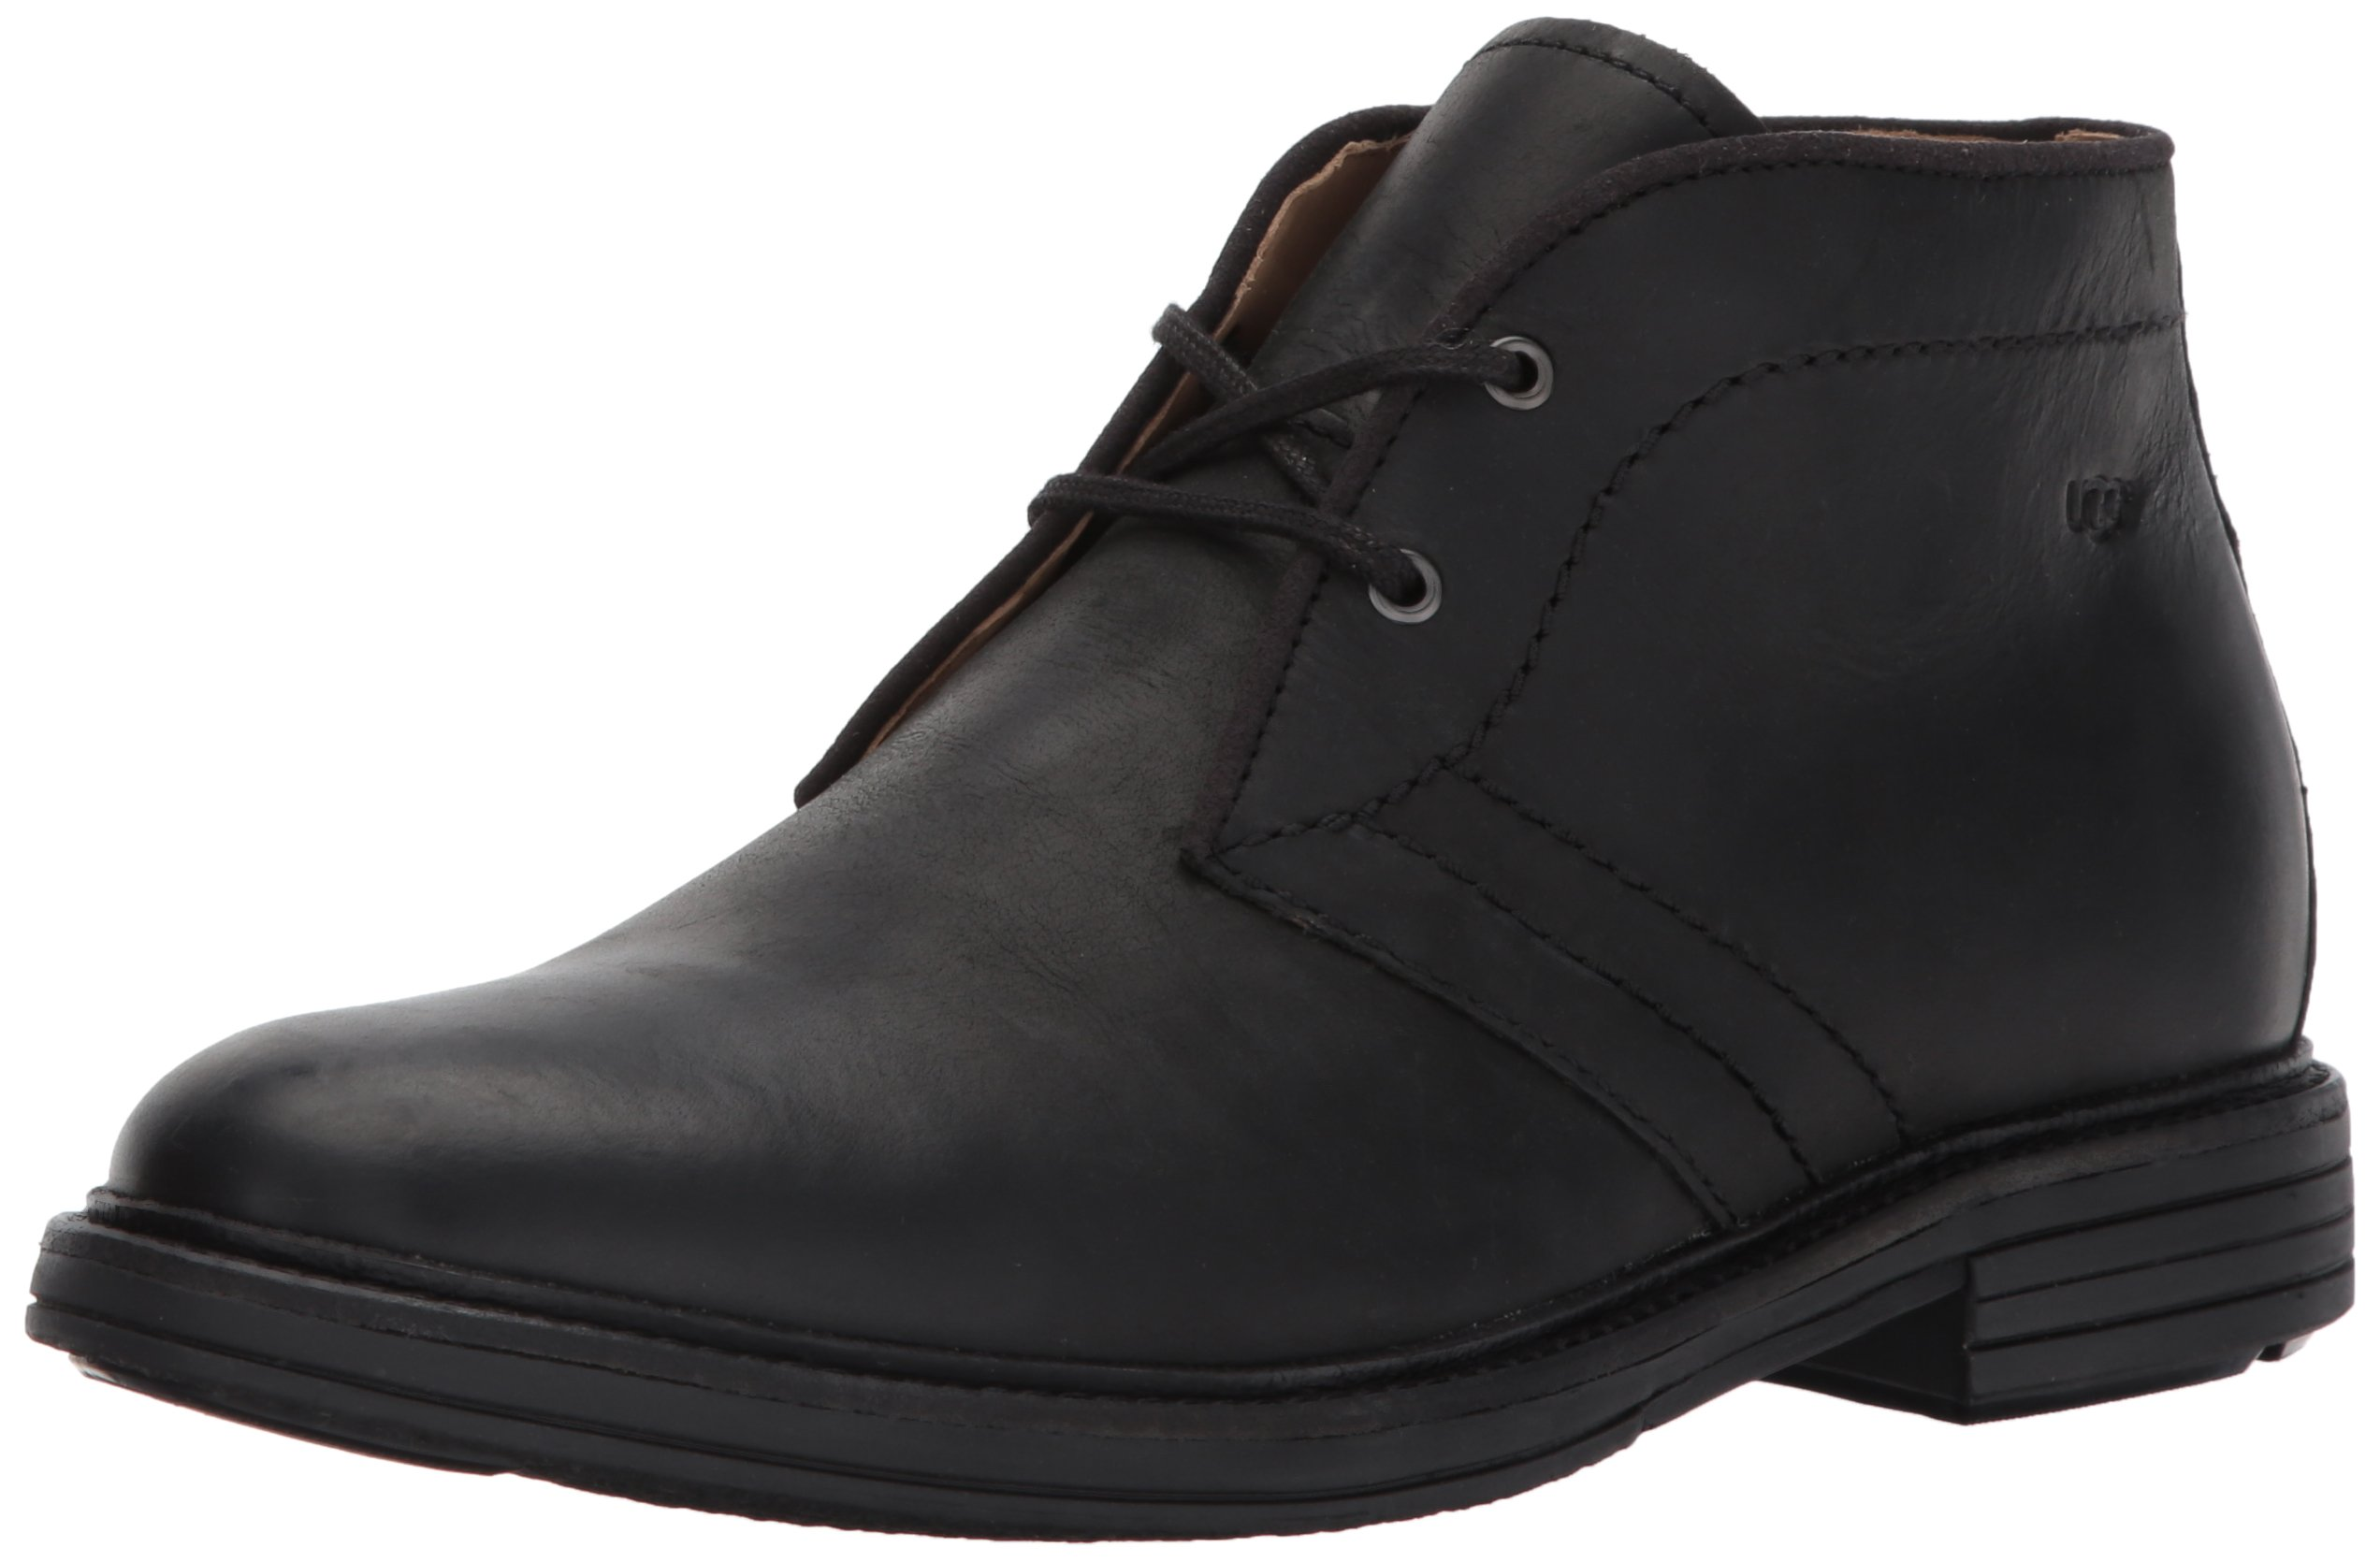 0db9556e576 Galleon - UGG Men's Dagmann Chukka Boot, Black, 8 M US